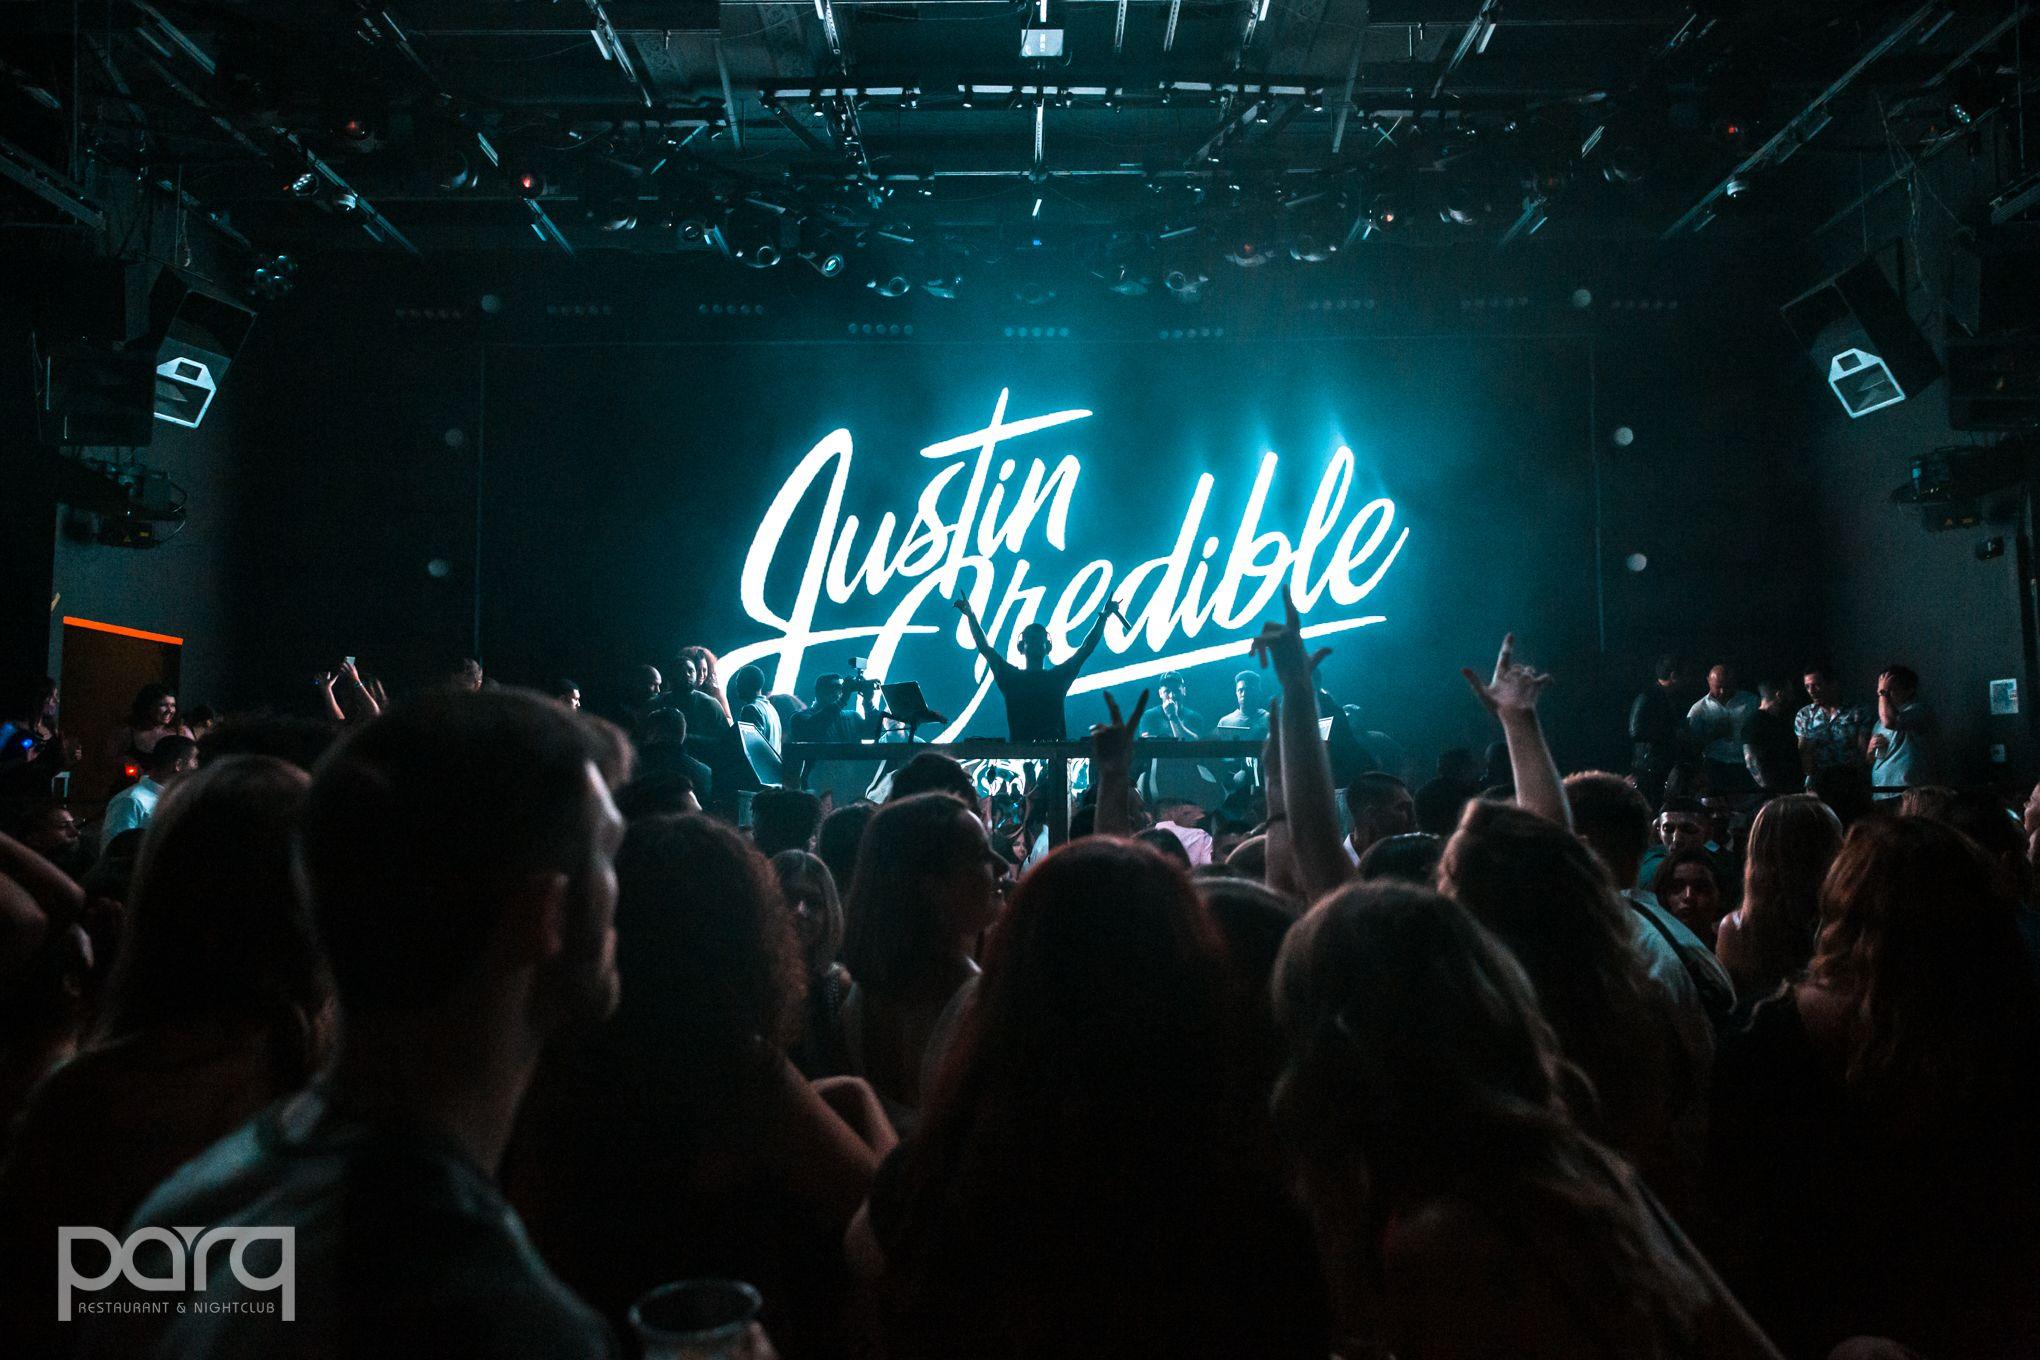 09.28.19 Parq - Justin Credible-15.jpg